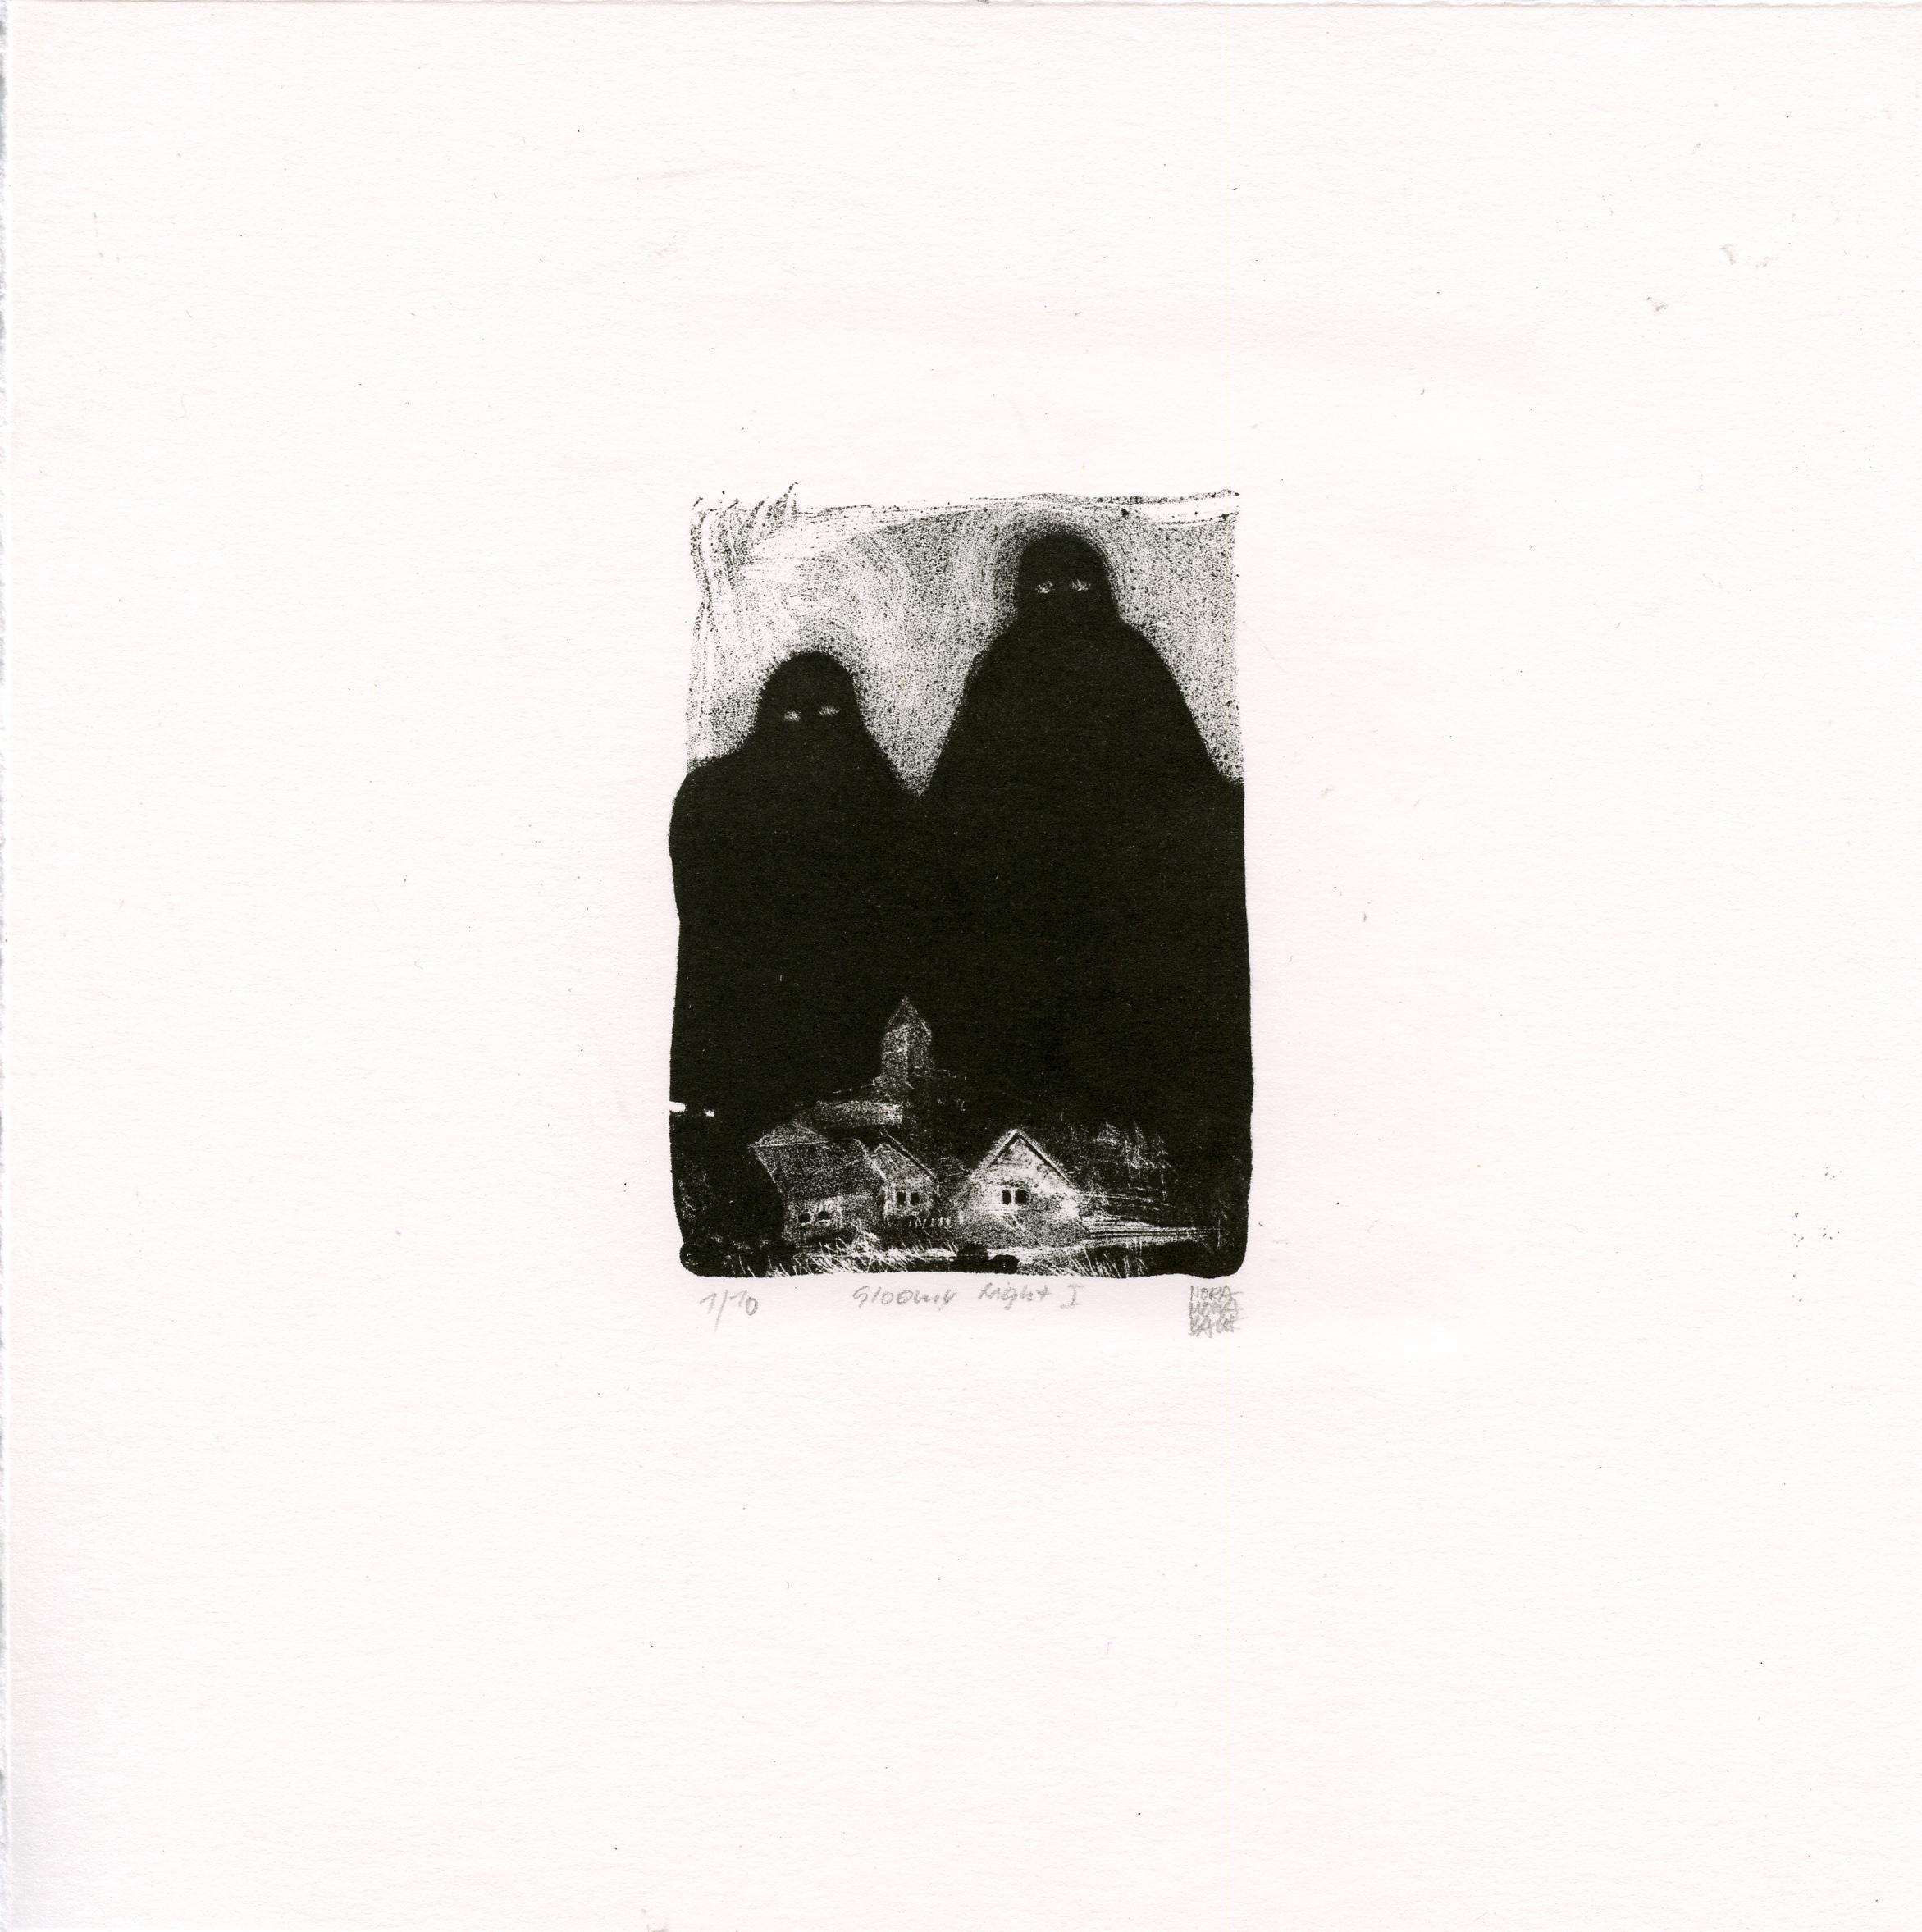 Bach, Mona Nora: Gloomy Night I lithography